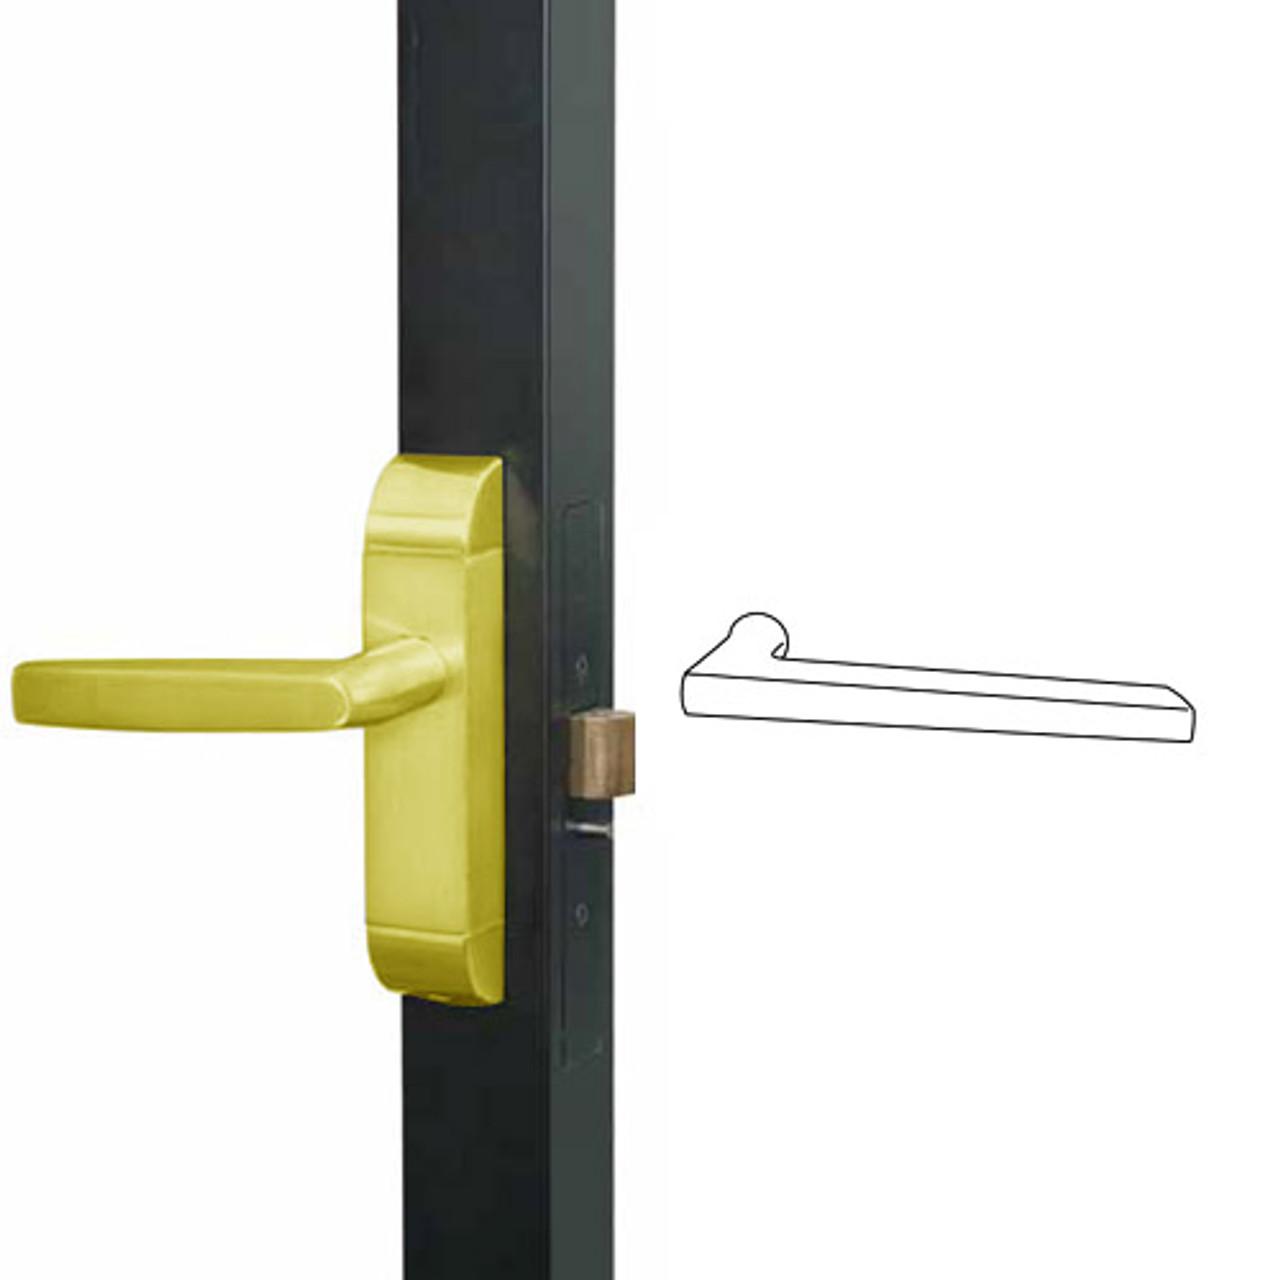 4600-MD-551-US3 Adams Rite MD Designer Deadlatch handle in Bright Brass Finish